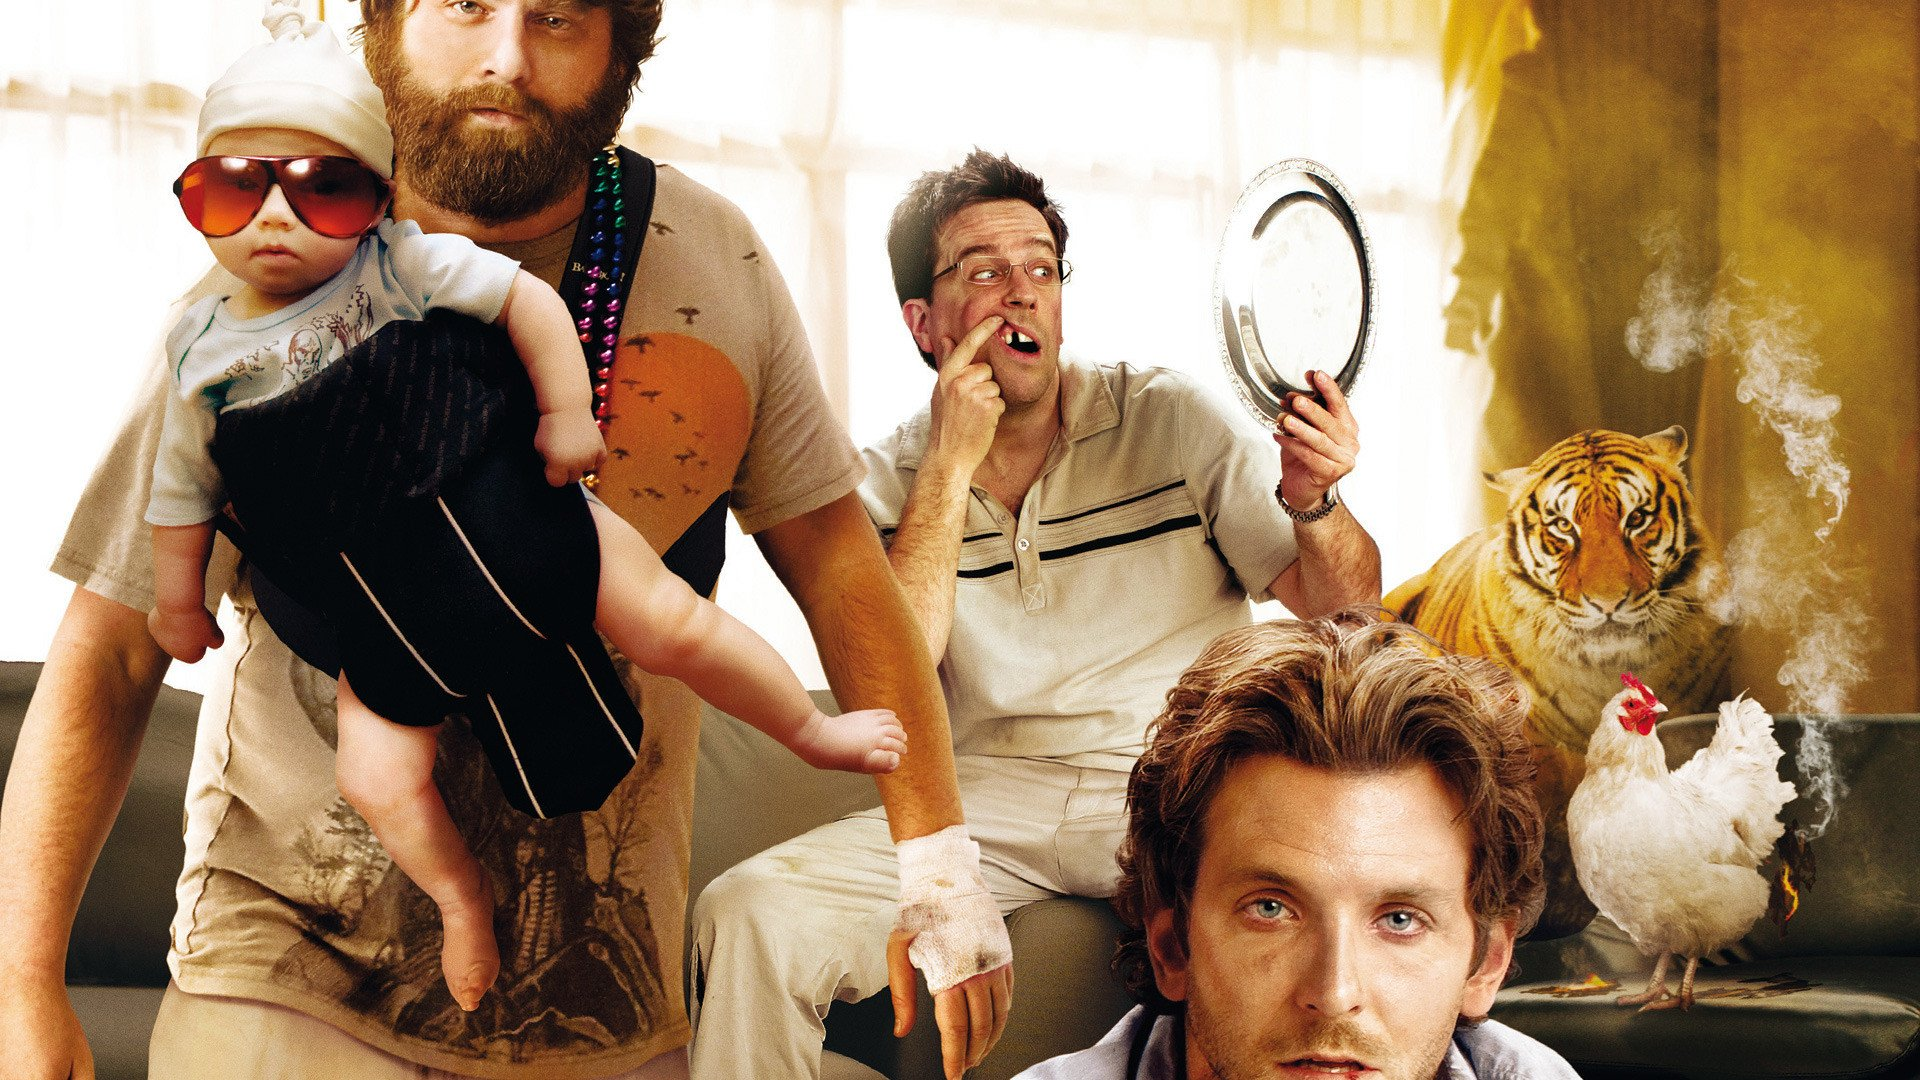 Movie - The Hangover  Bradley Cooper Zach Galifianakis Ed Helms Wallpaper